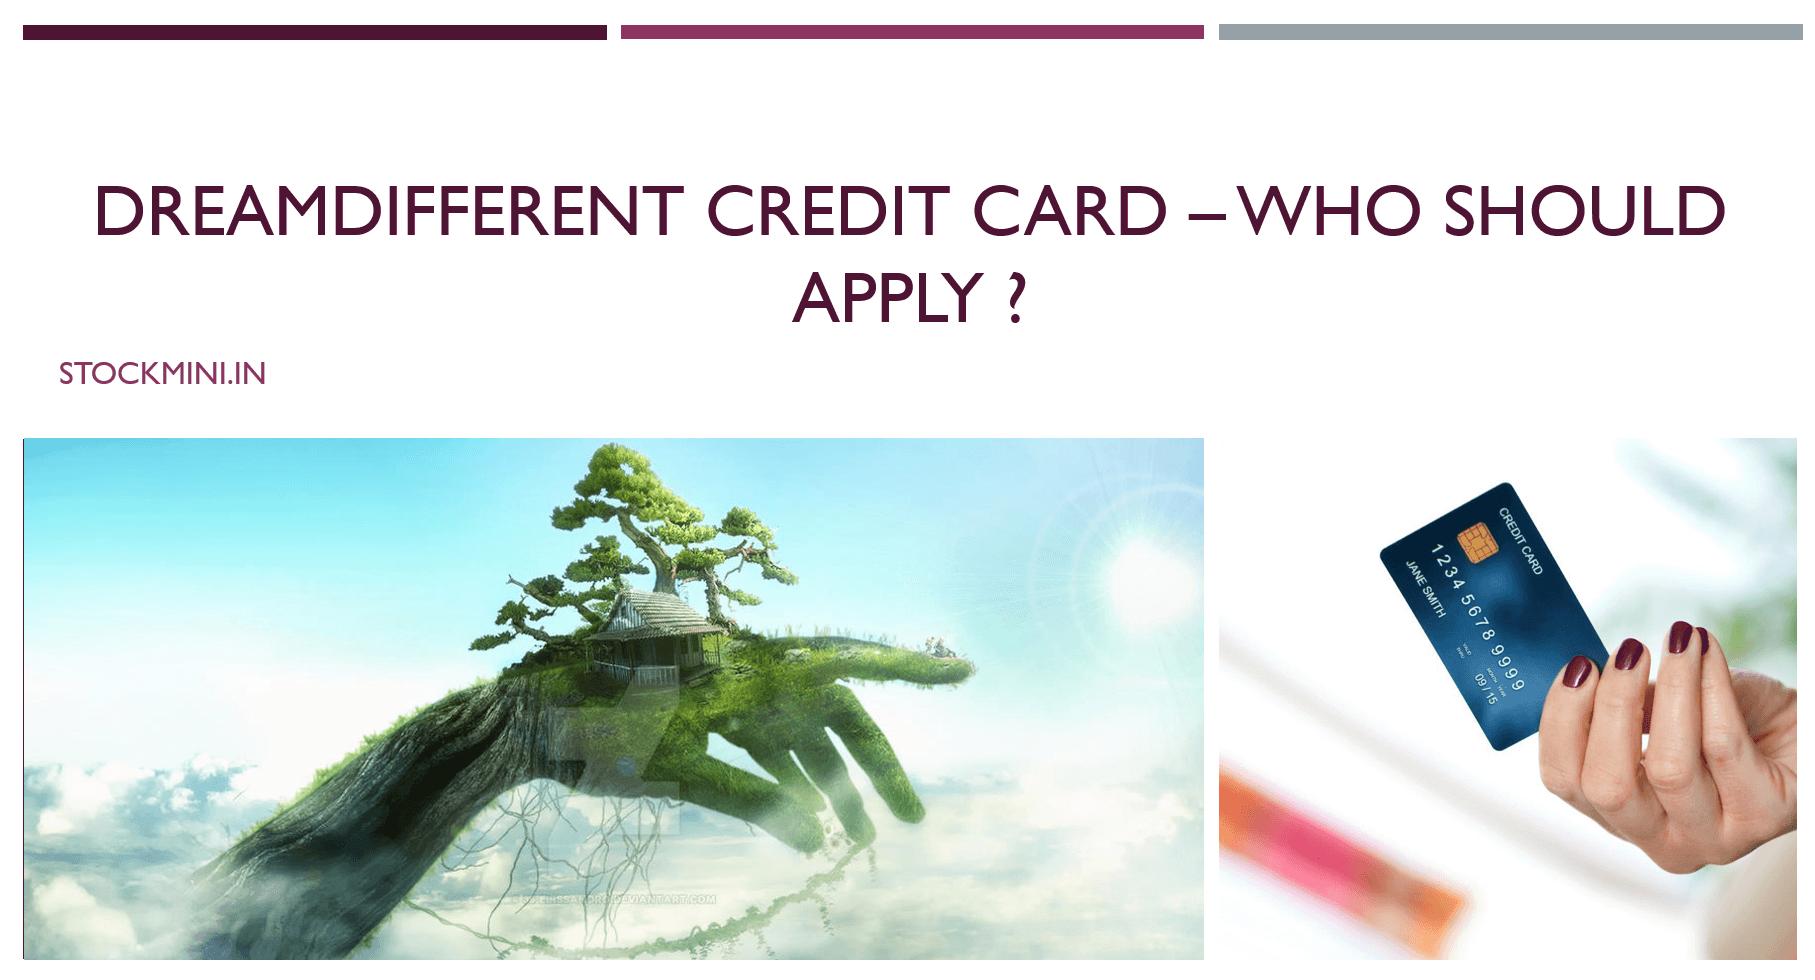 811 #DreamDifferent Credit Card